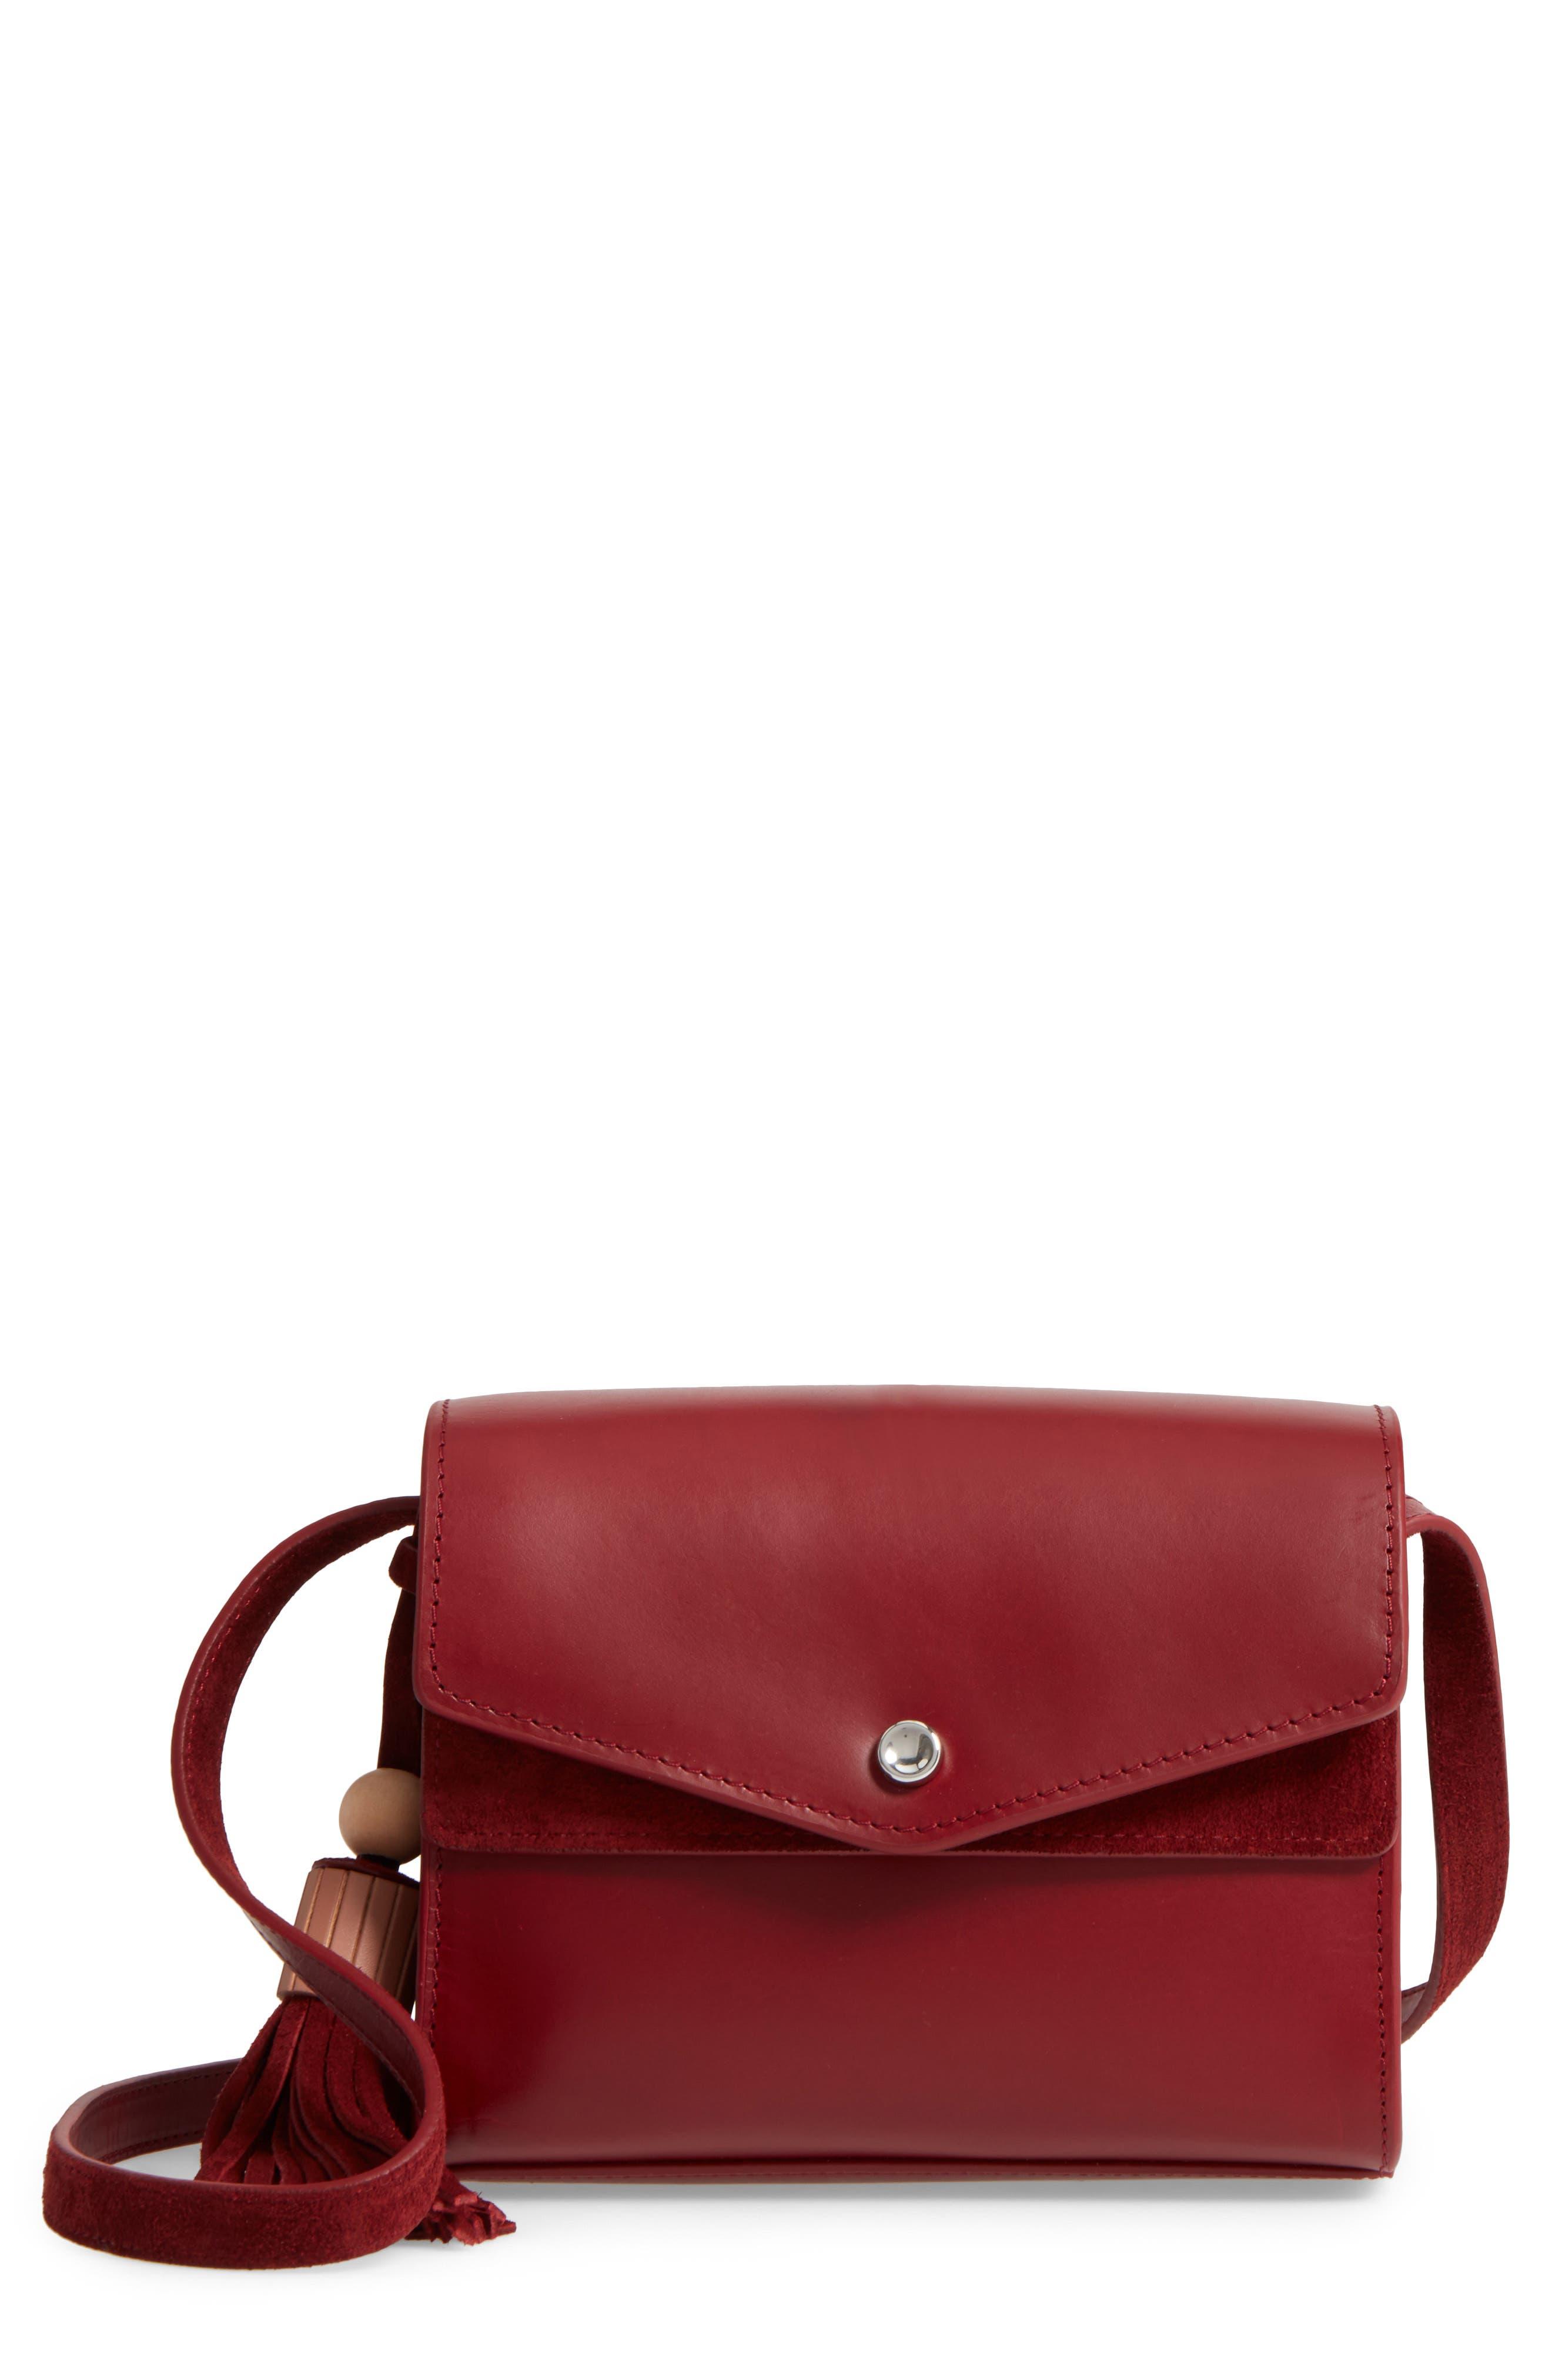 Eloise Field Crossbody Bag,                             Main thumbnail 1, color,                             612